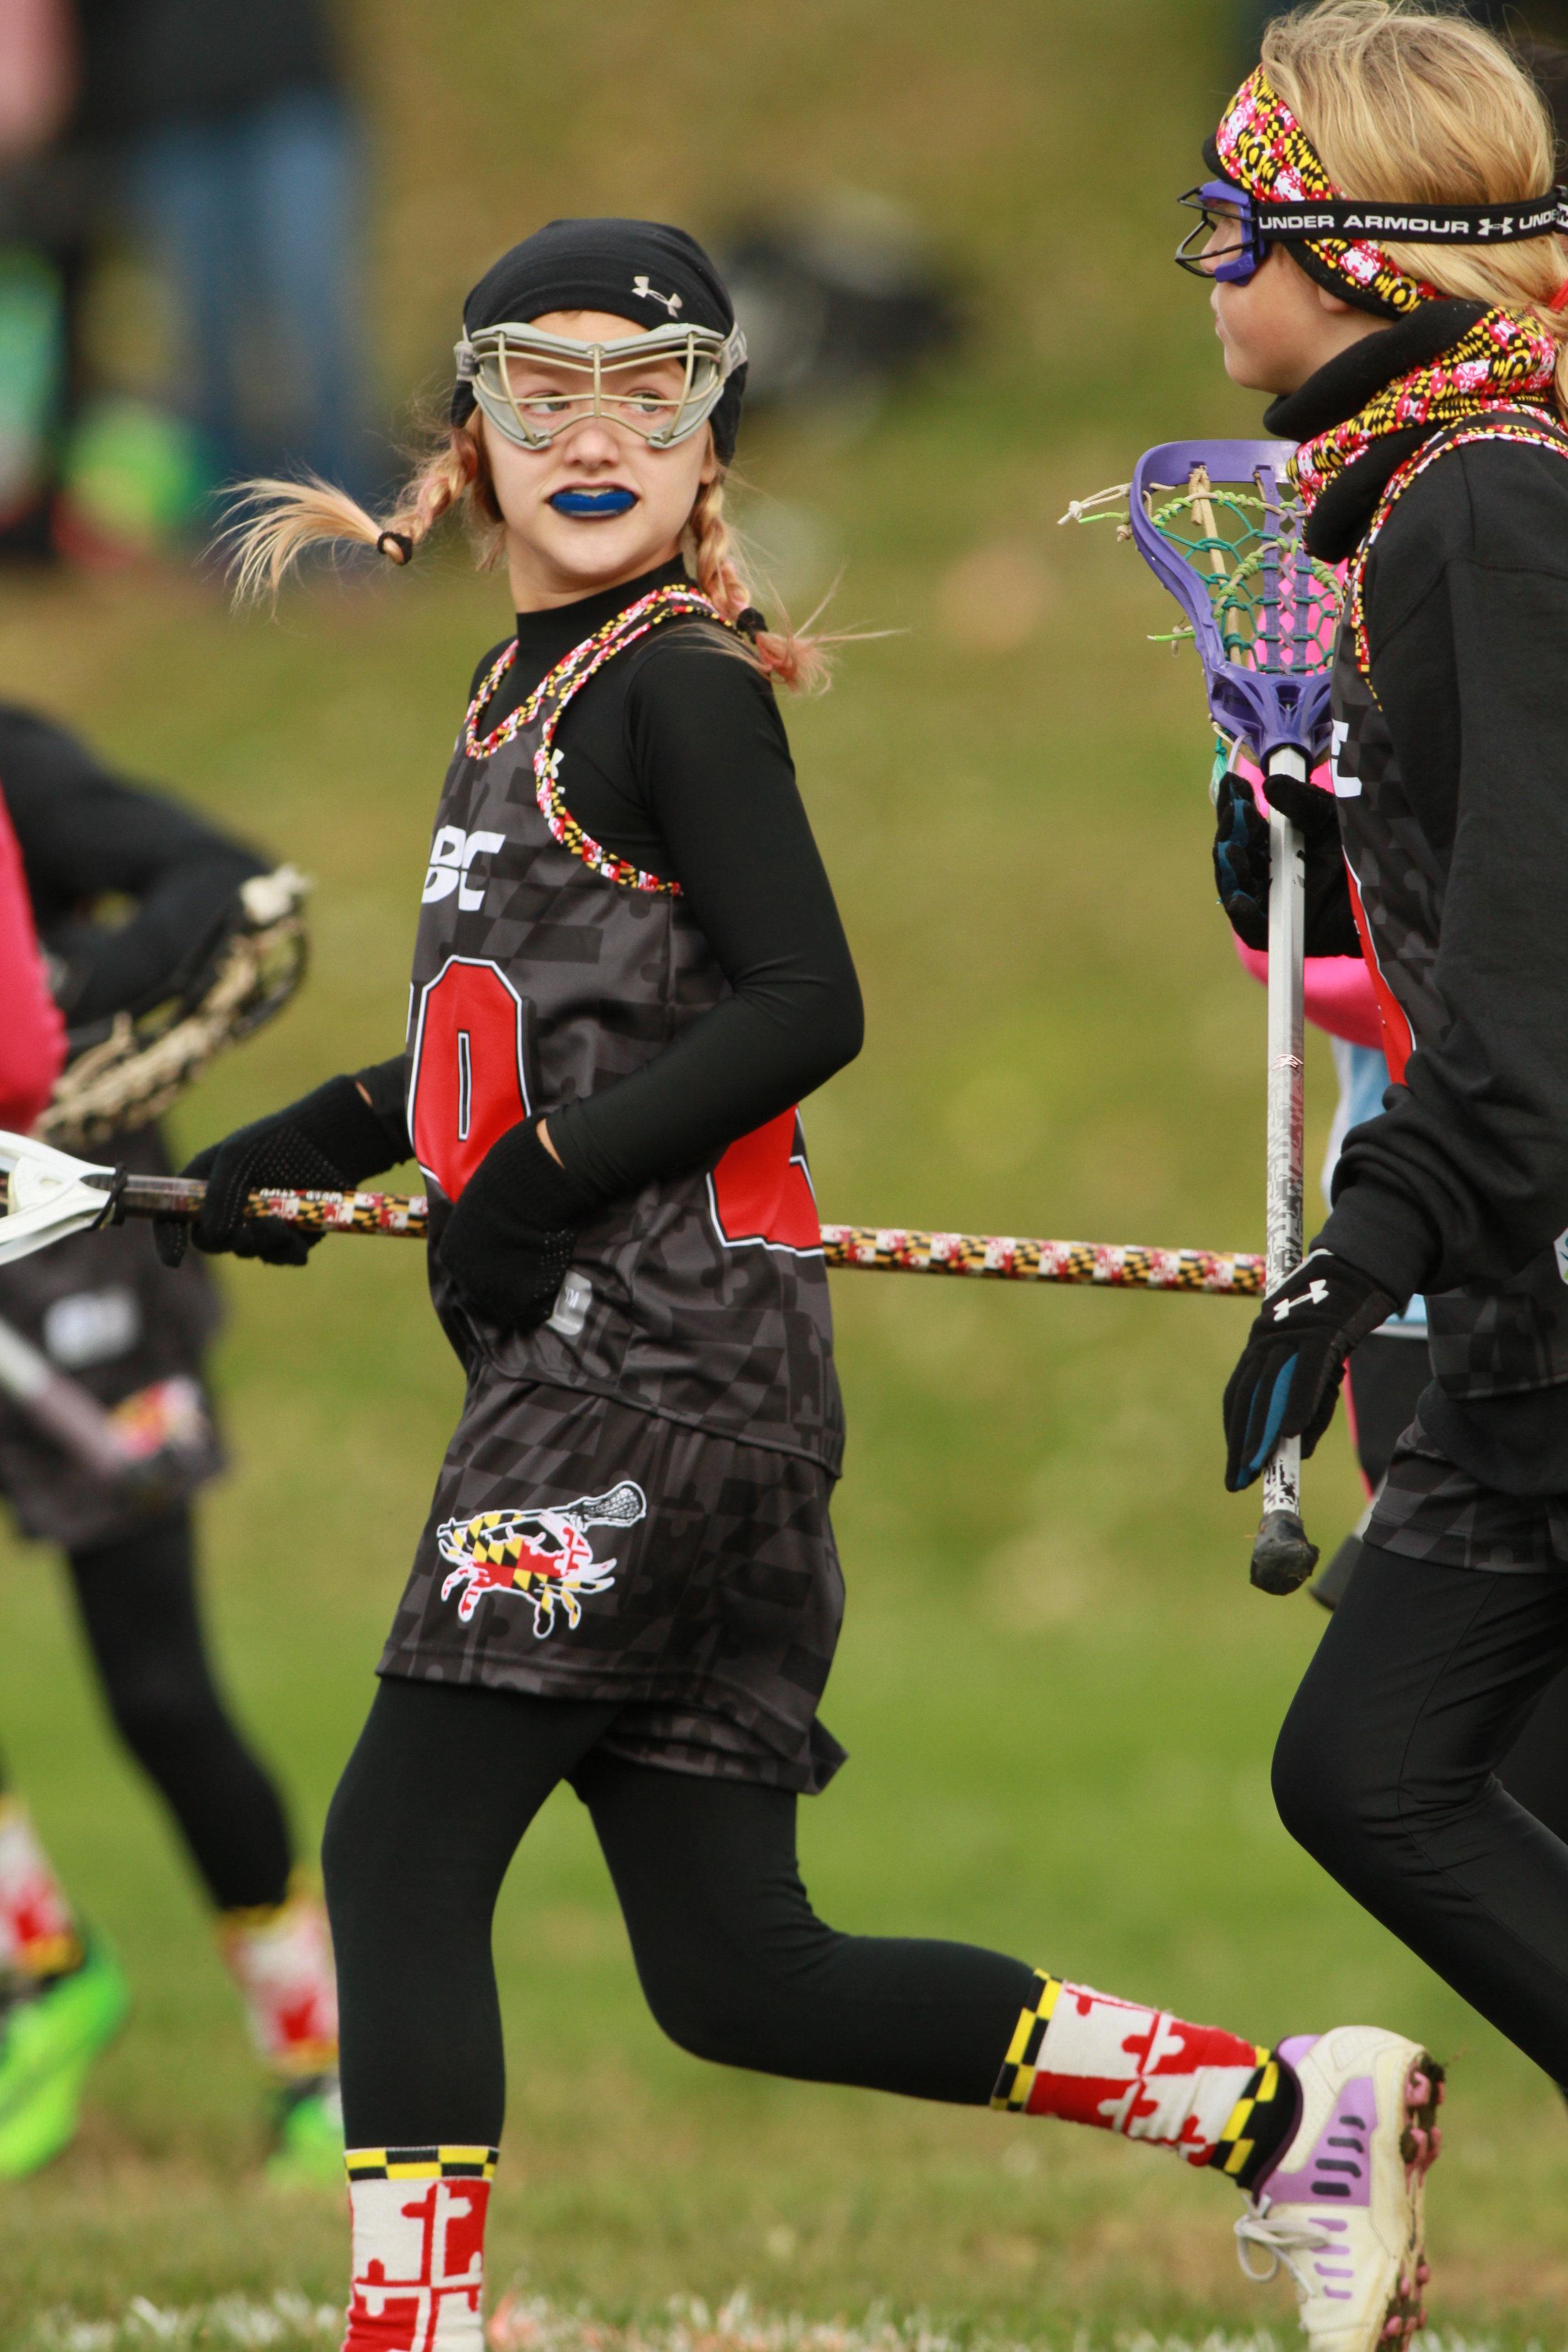 Piper Evans - Chestertown, MD - Lacrosse, Soccer & Basketball